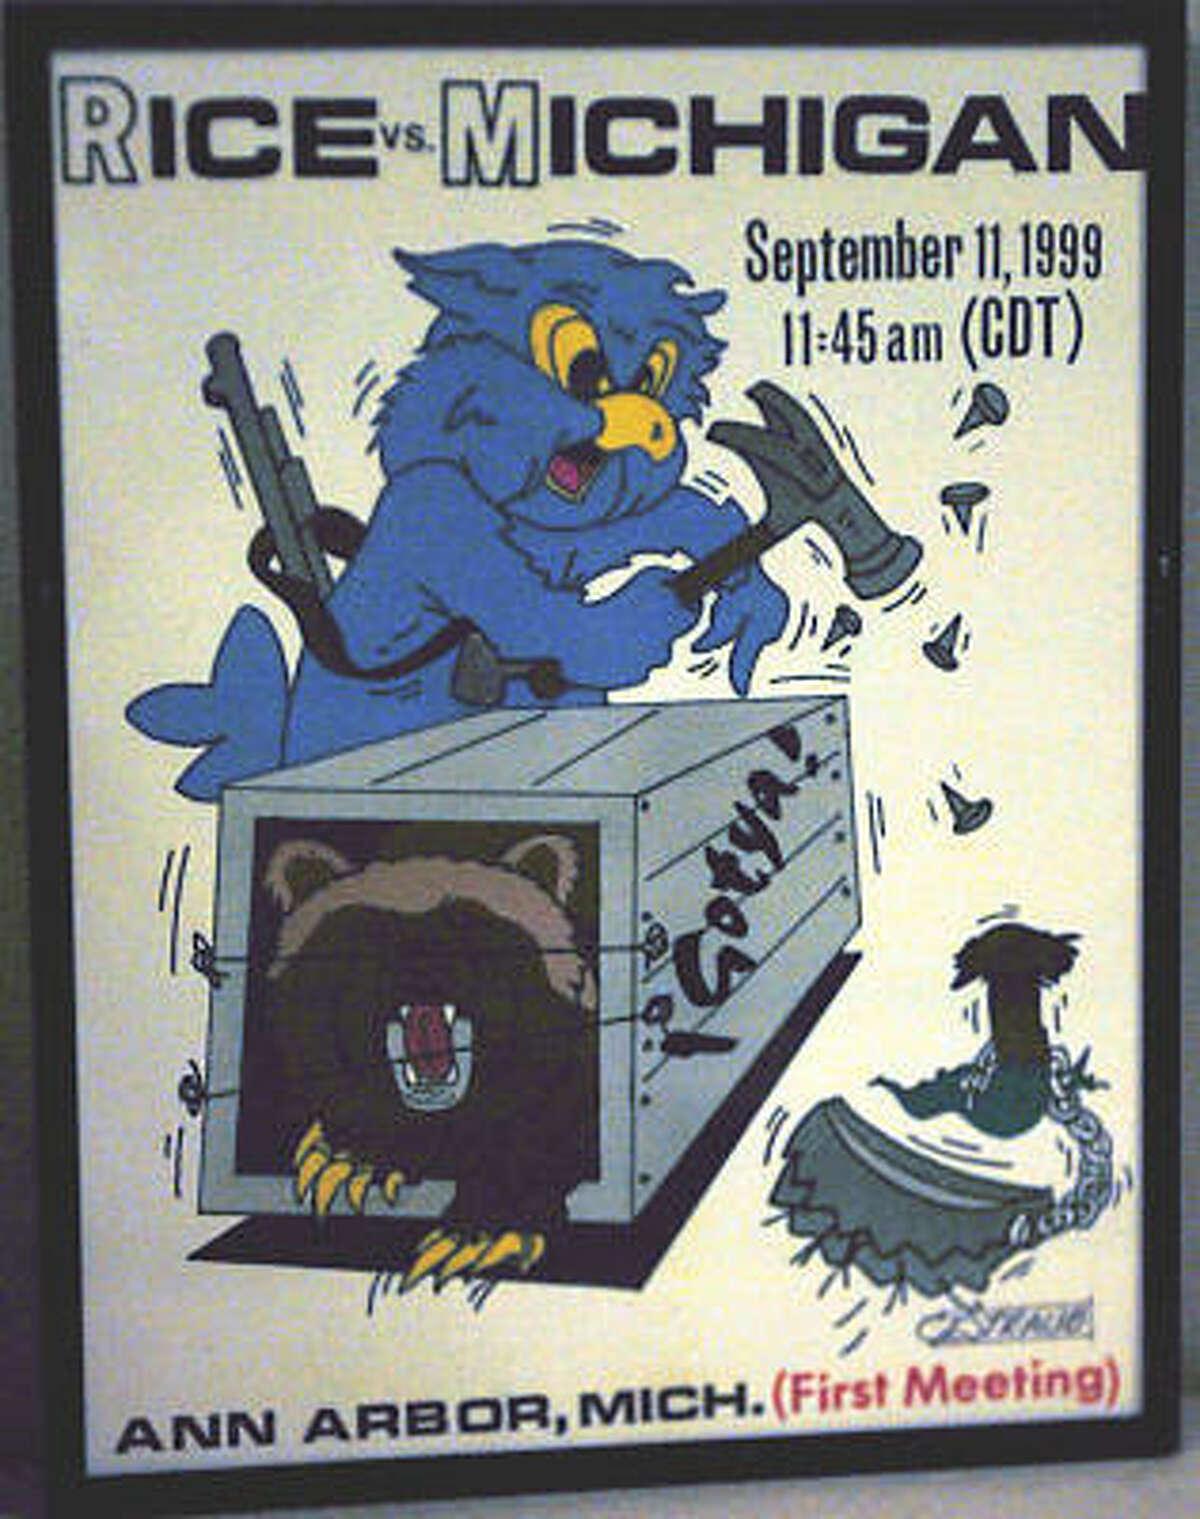 Rice vs. Michigan (Sept. 11, 1999)